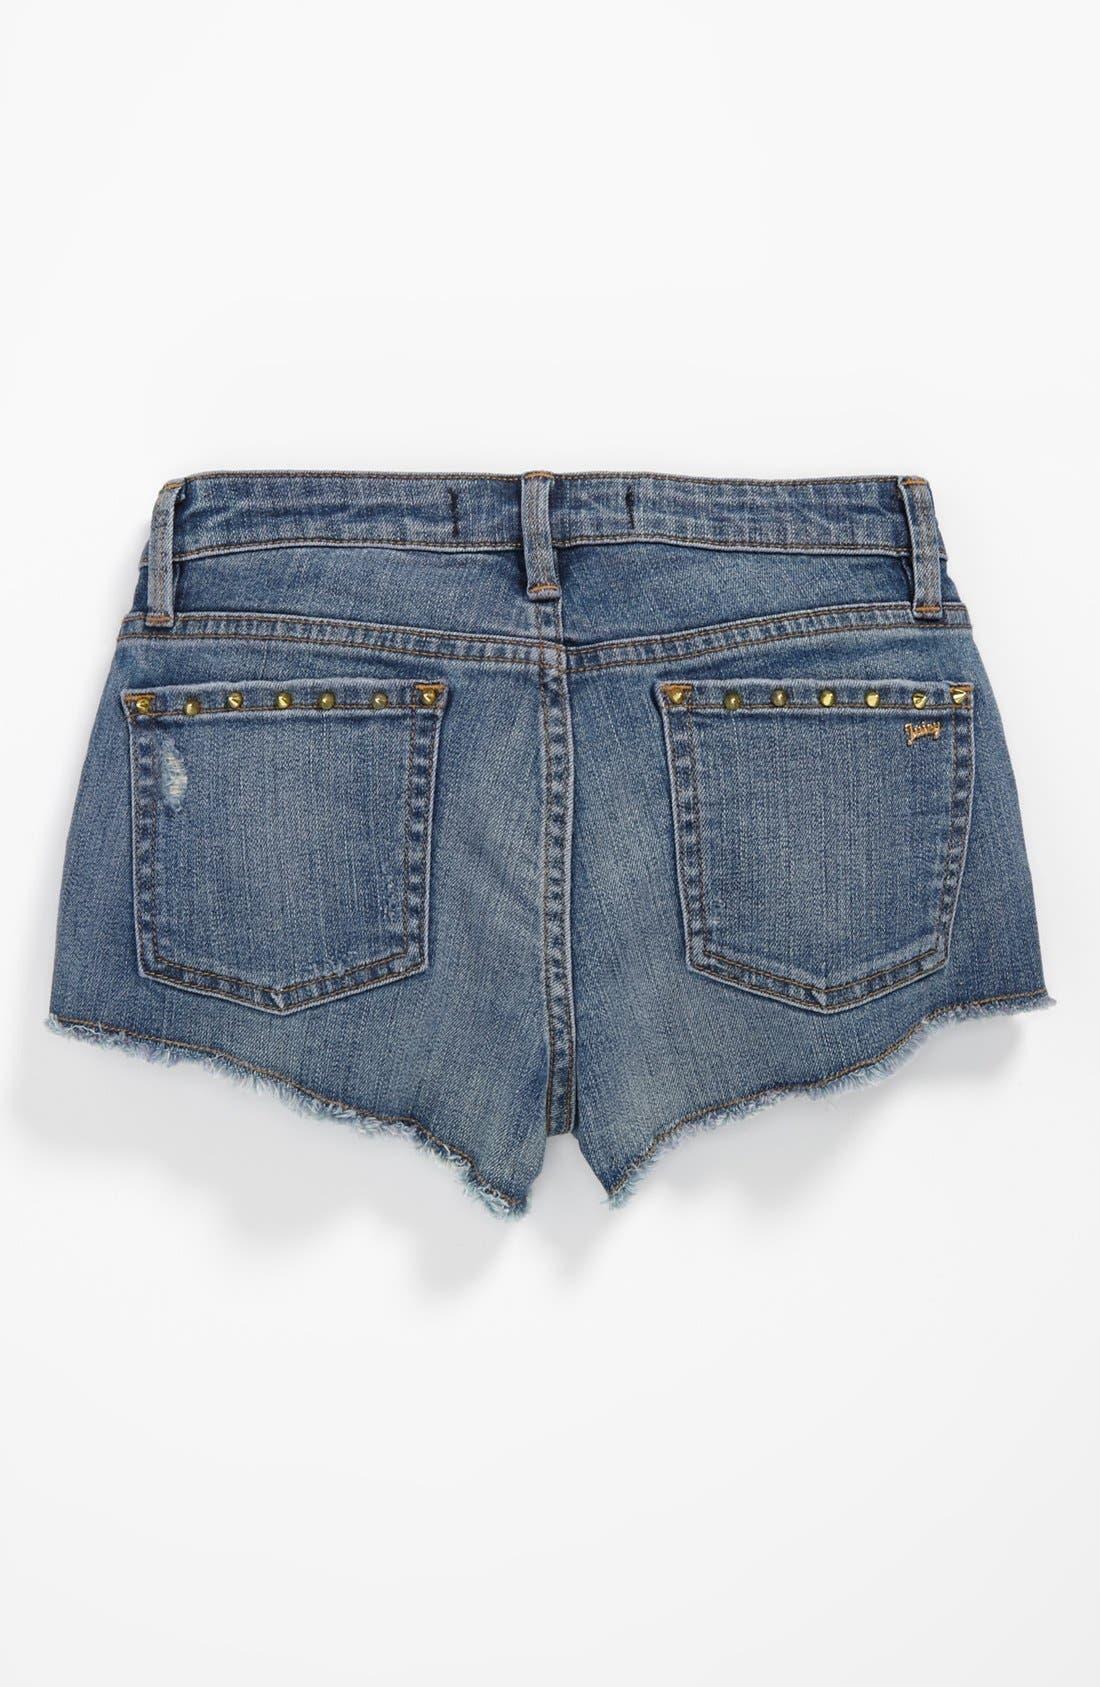 Main Image - Juicy Couture 'Core' Denim Cutoff Shorts (Big Girls)